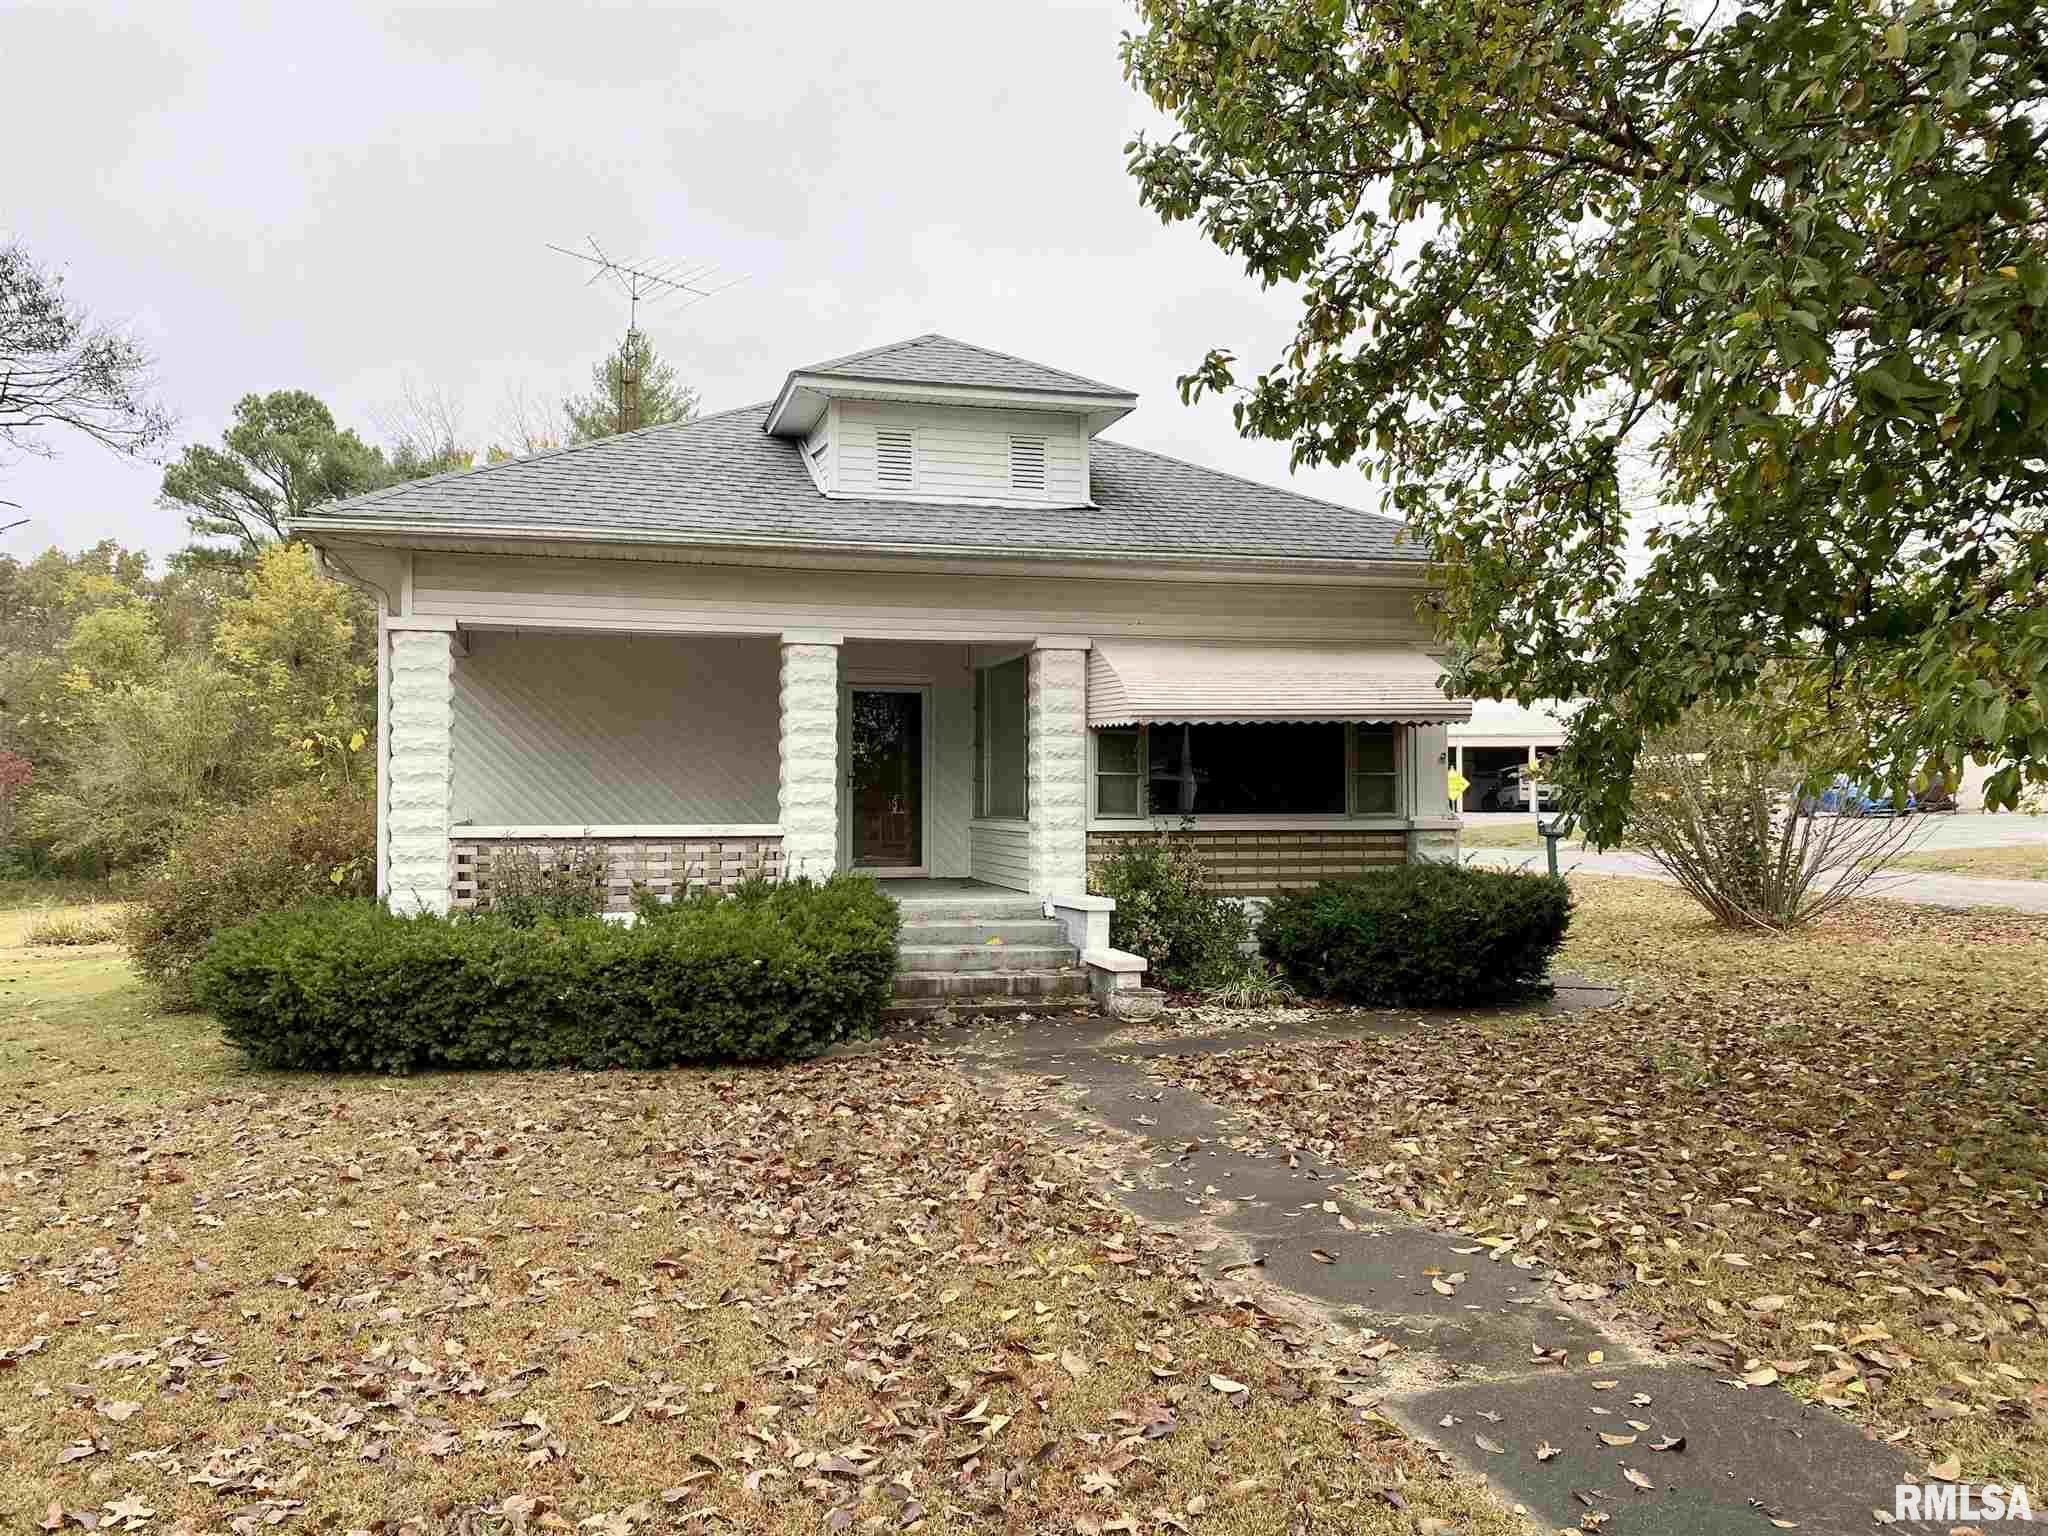 3869 THOMPSON Property Photo - Thompsonville, IL real estate listing